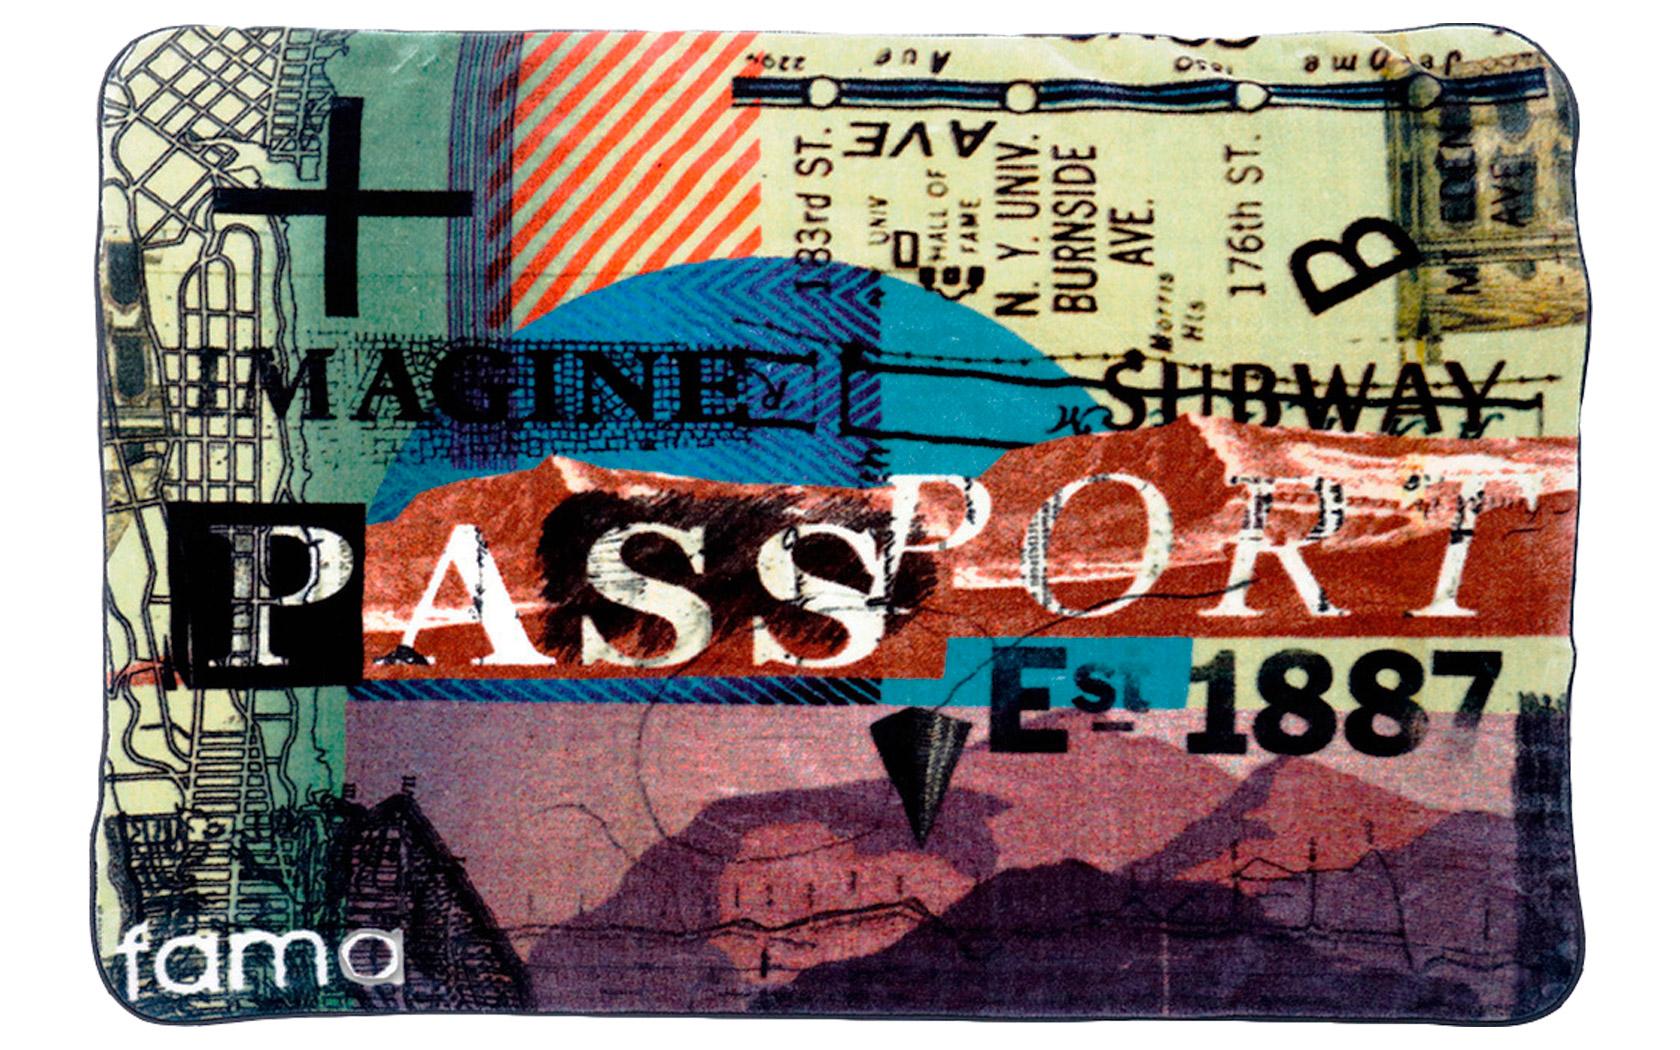 Manta Passport 02